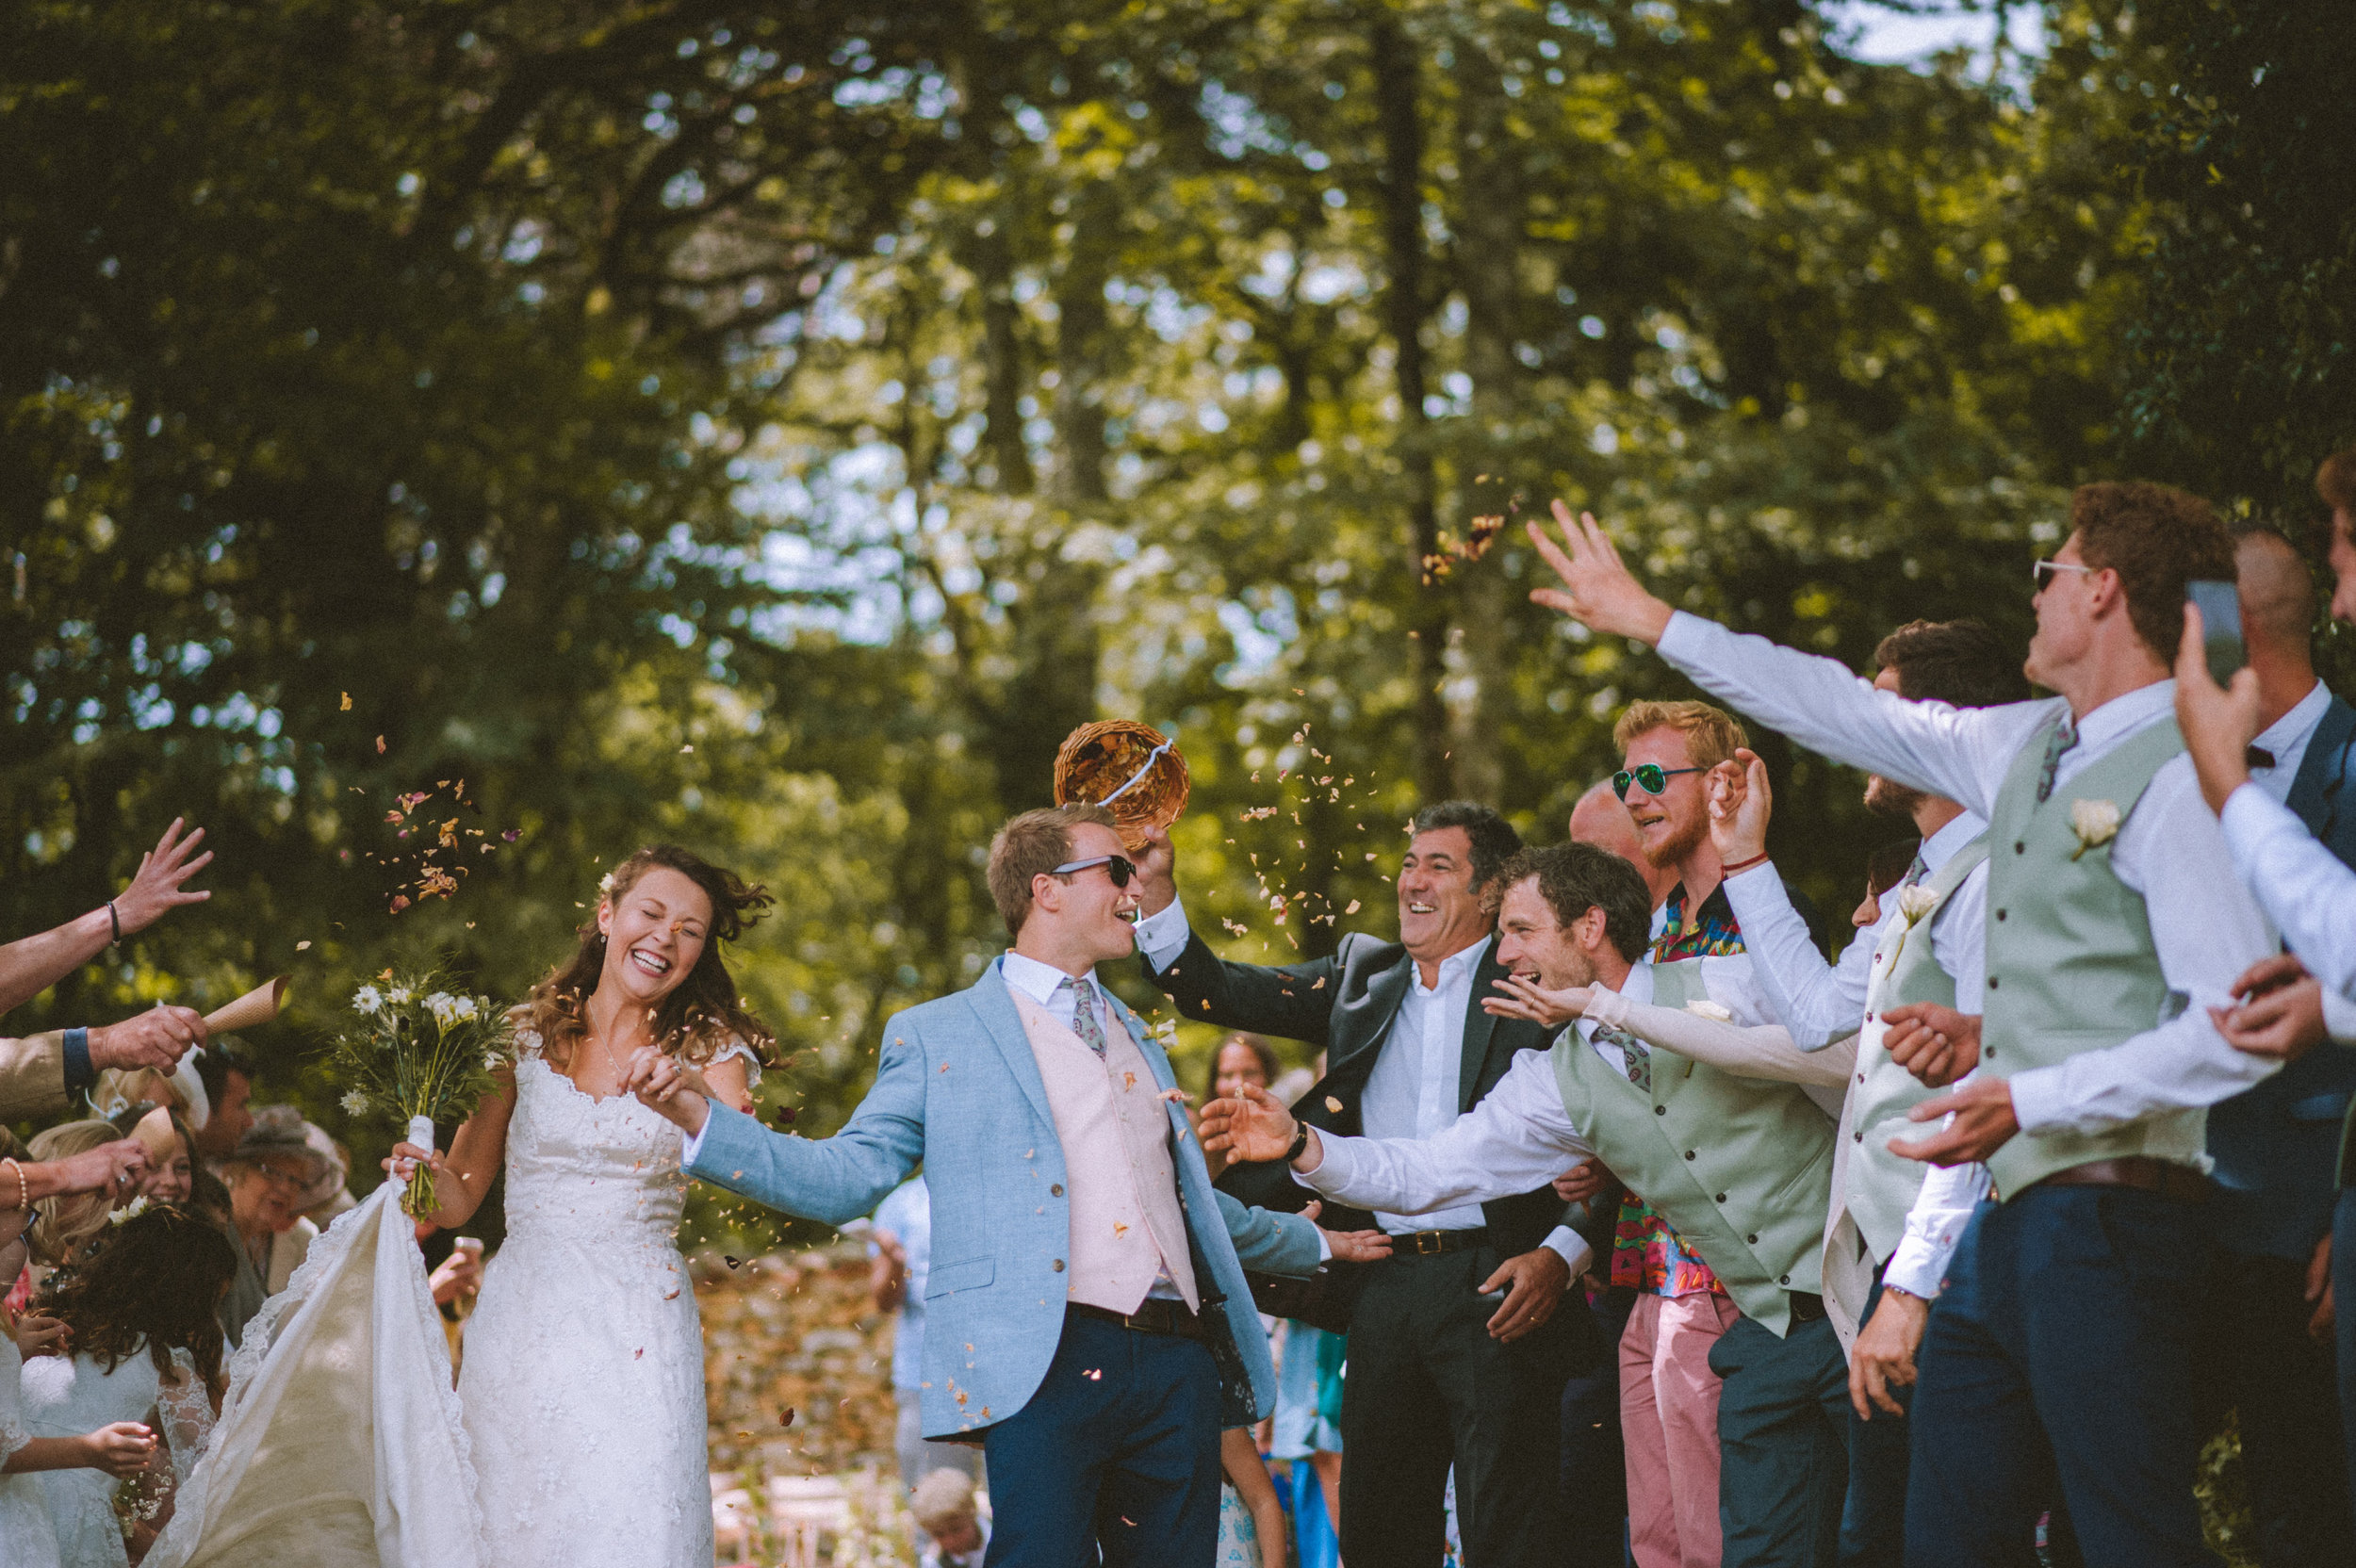 wedding-photographer-dordogne-mark-shaw-6.jpg